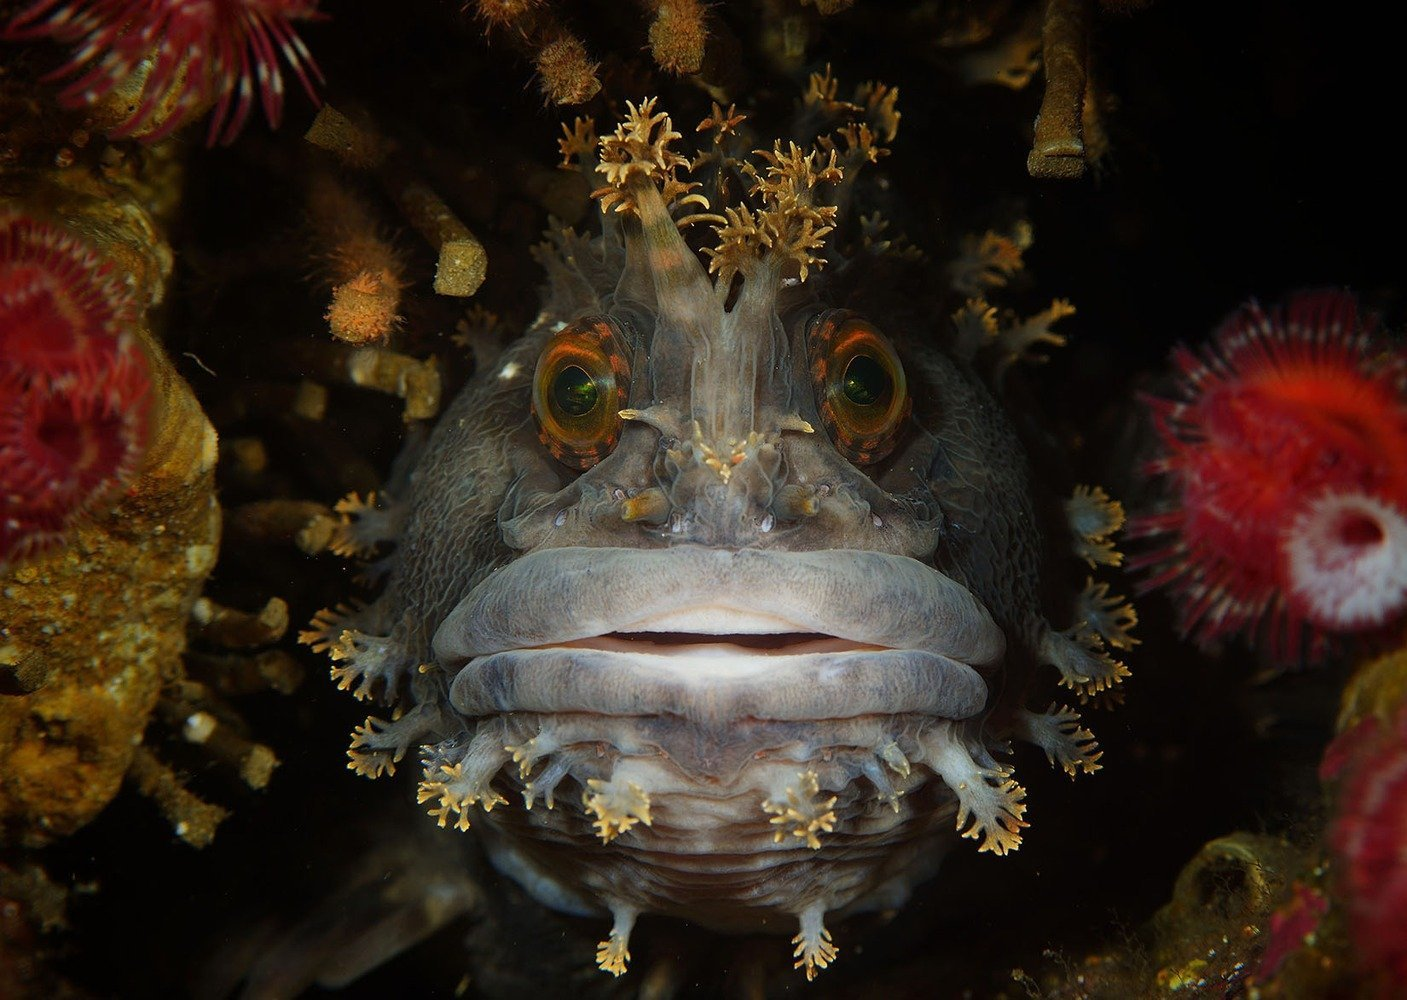 university-miami-underwater-best-overall-01